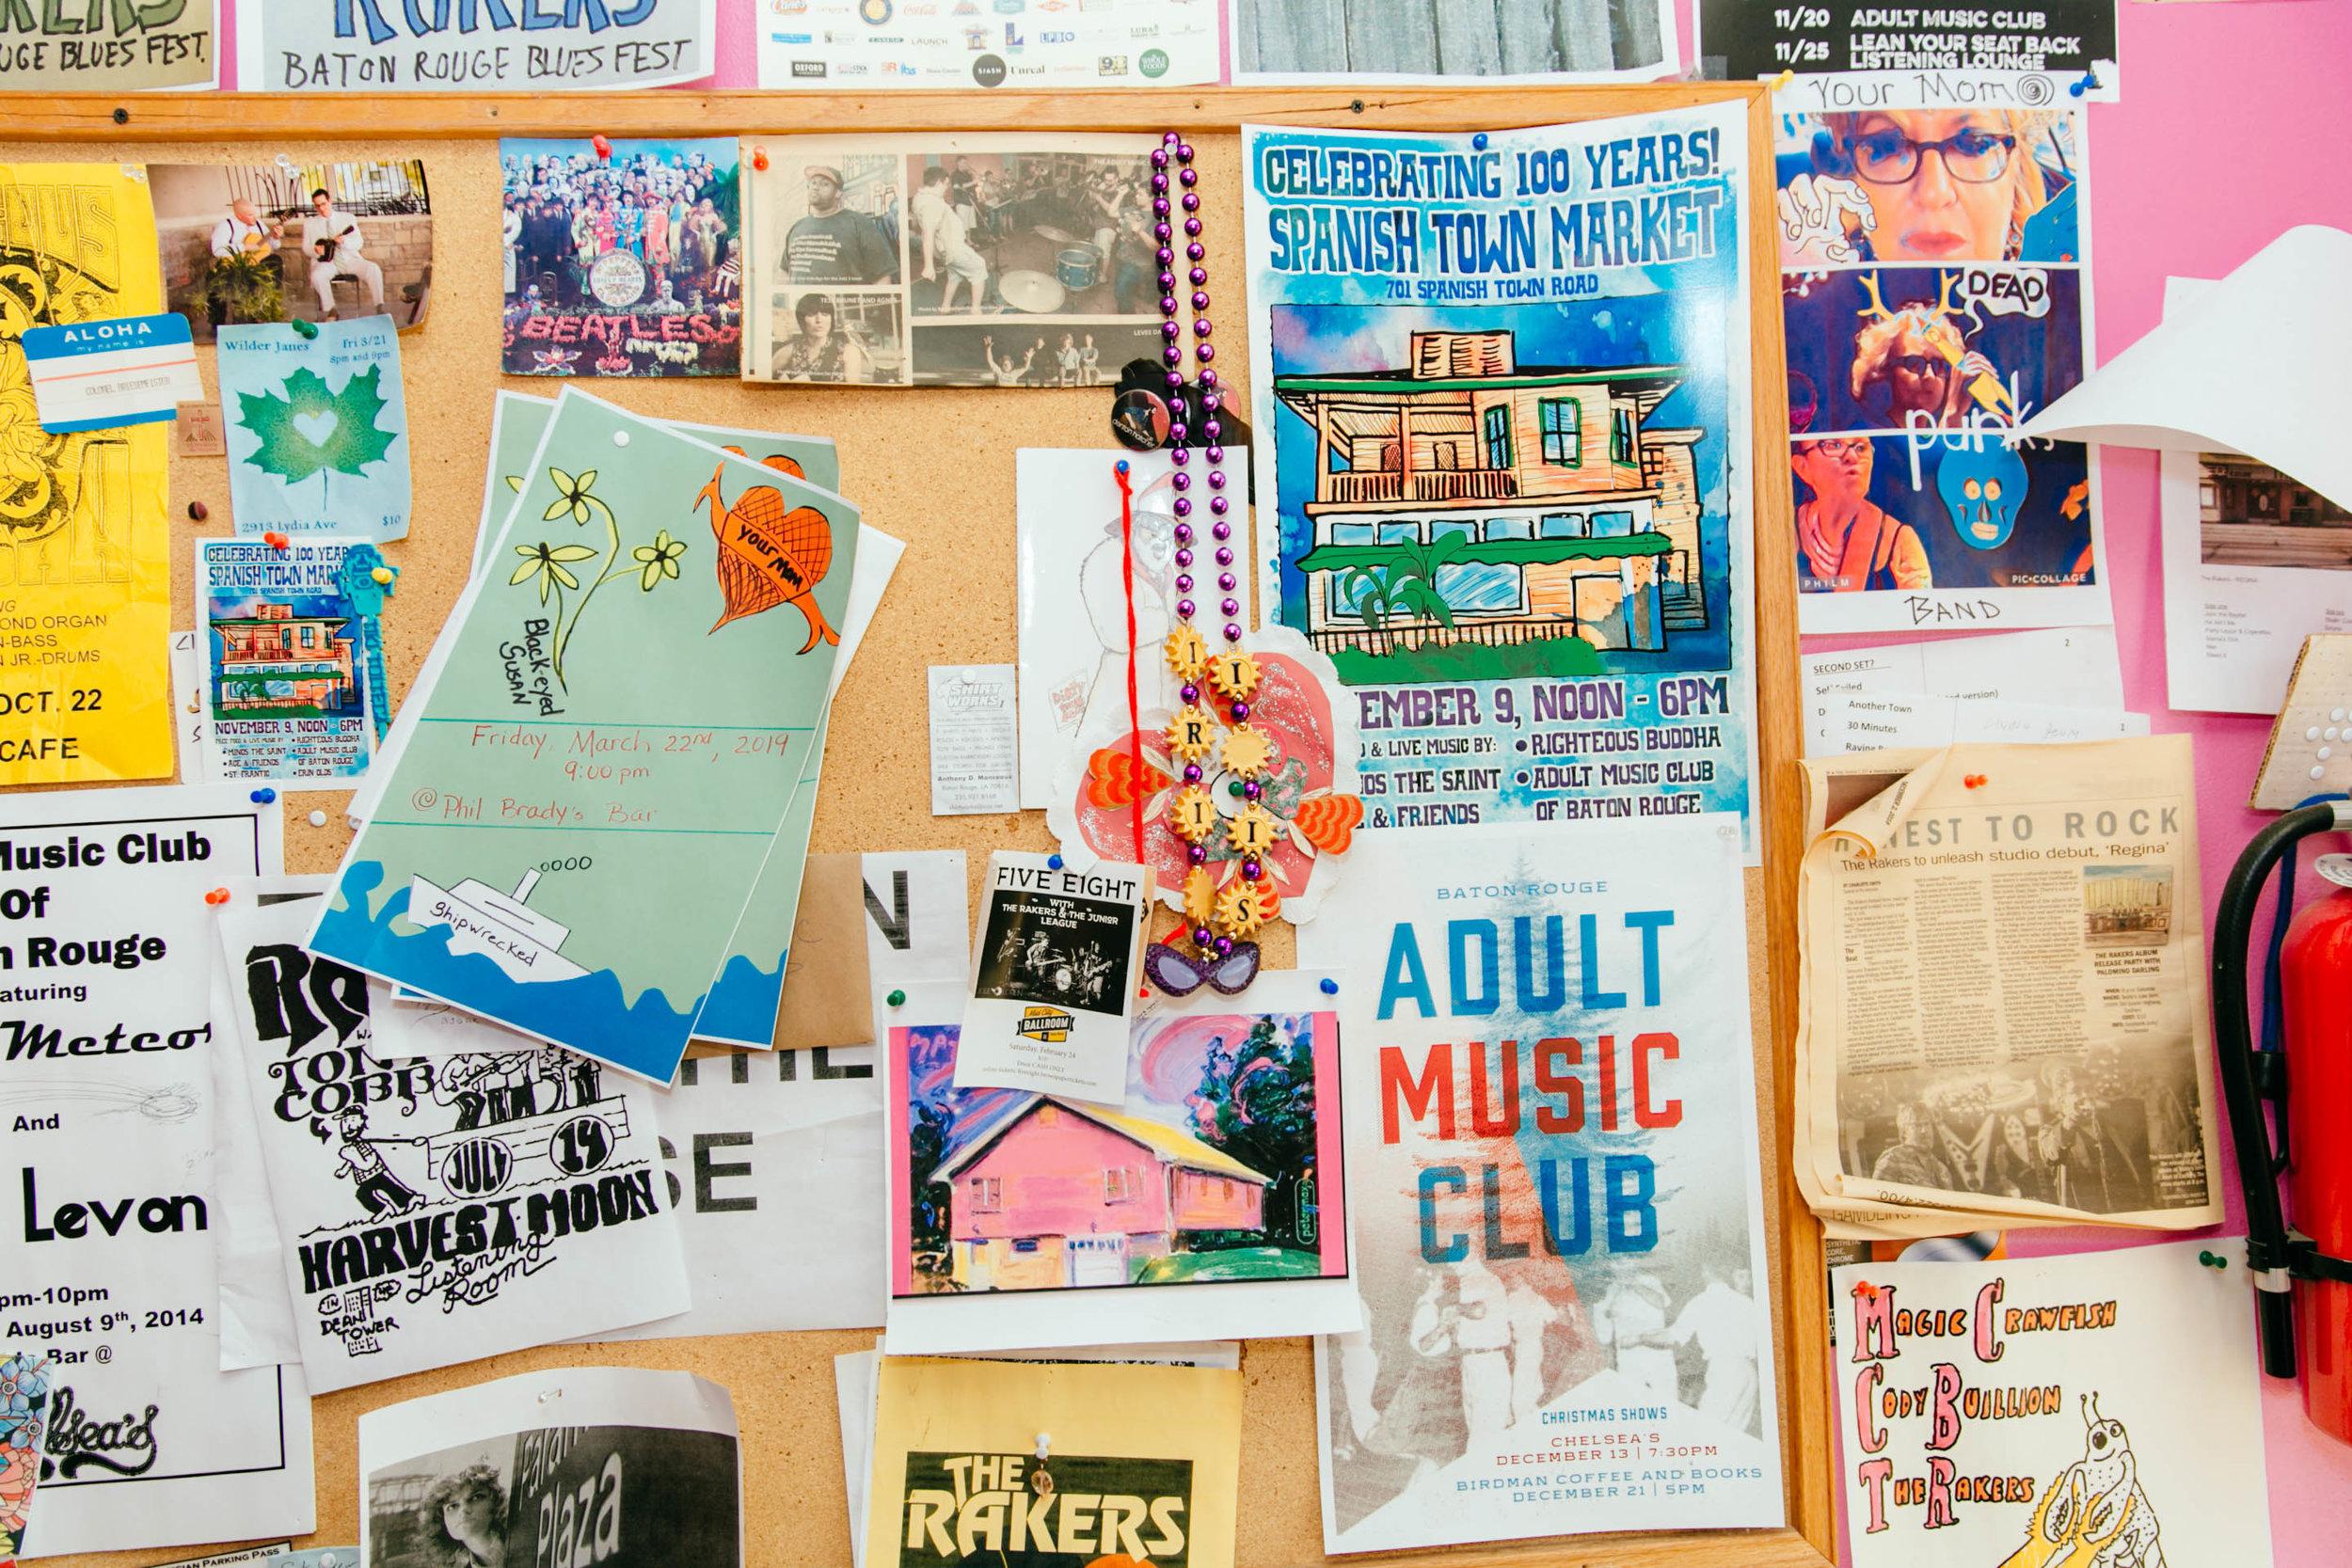 adultmusicclub (1 of 1)-9.jpg